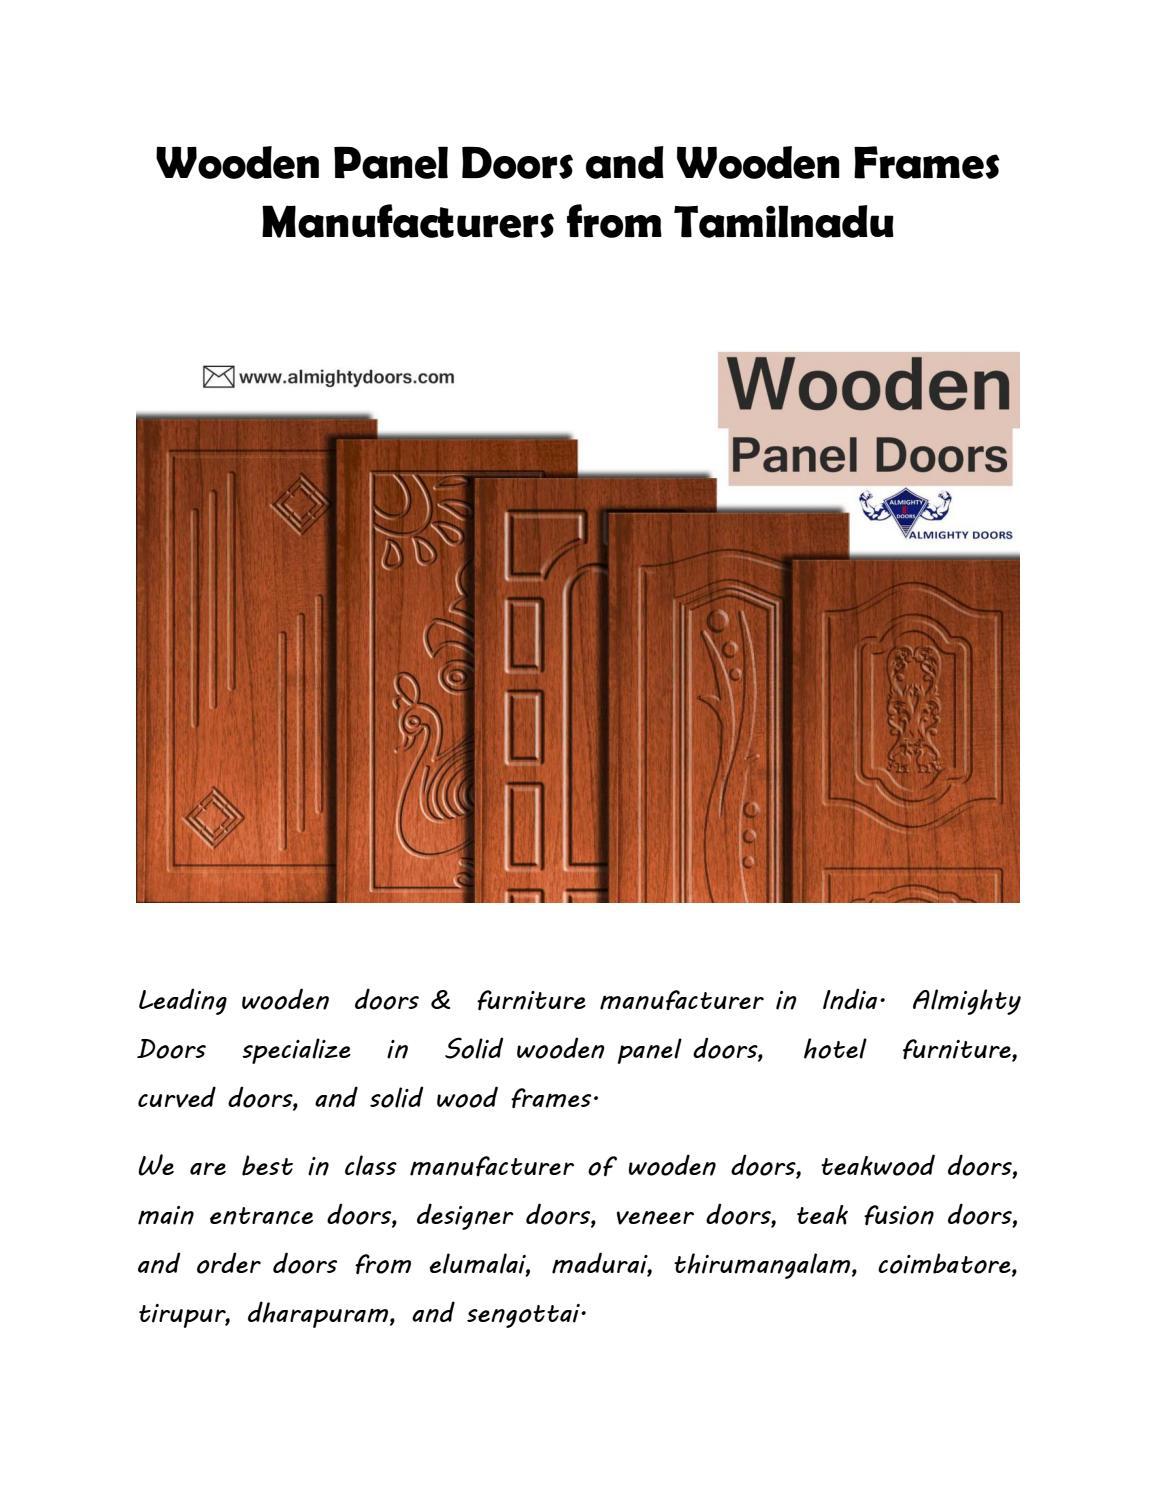 Wooden Furniture Manufacturers In Coimbatore Coimbatore